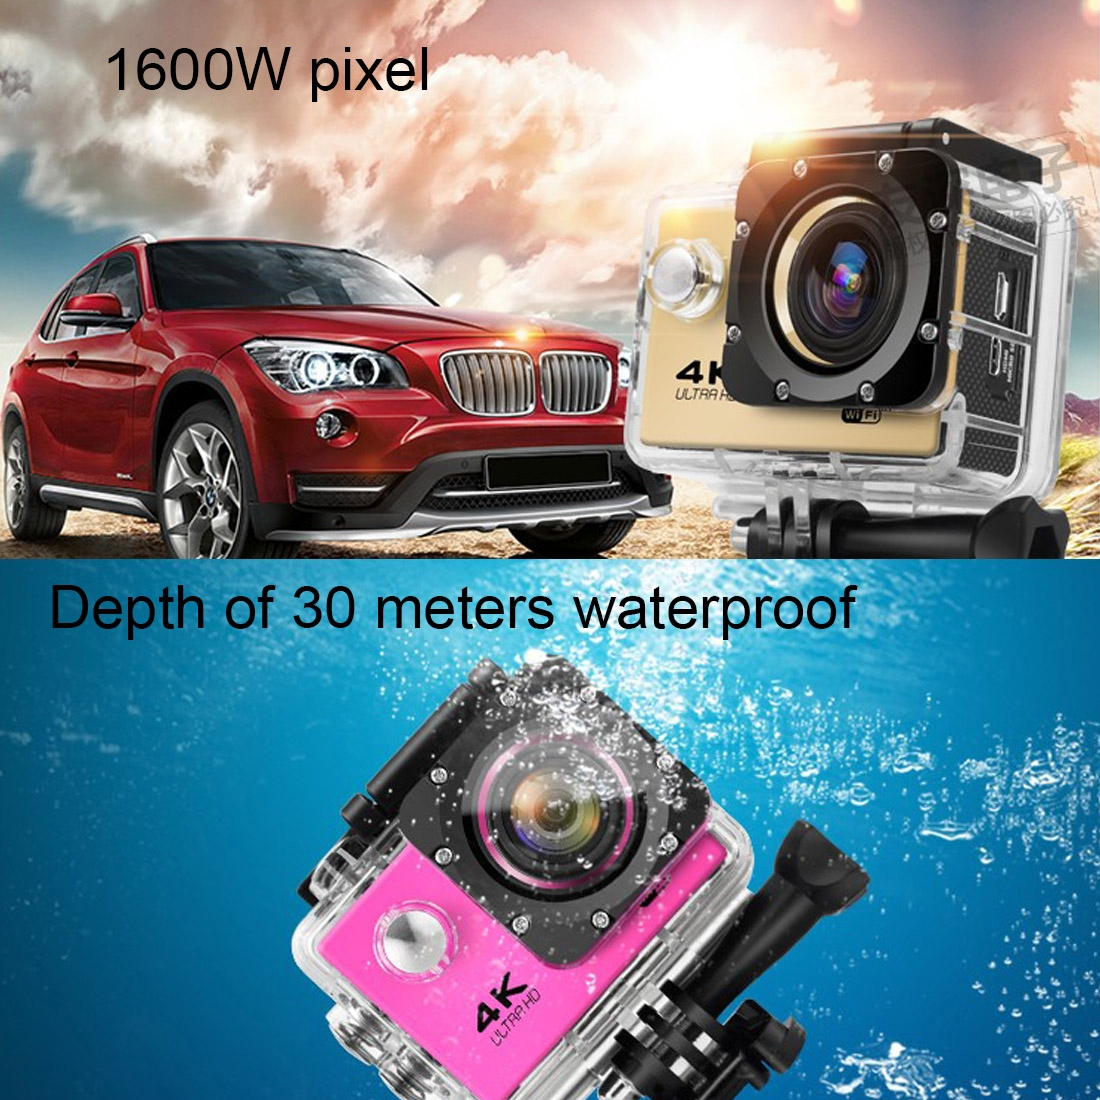 2,0 дюймовая HD спортивная мини-камера DVR 4K видео Беспроводная Wifi Водонепроницаемая Спортивная Экшн-камера